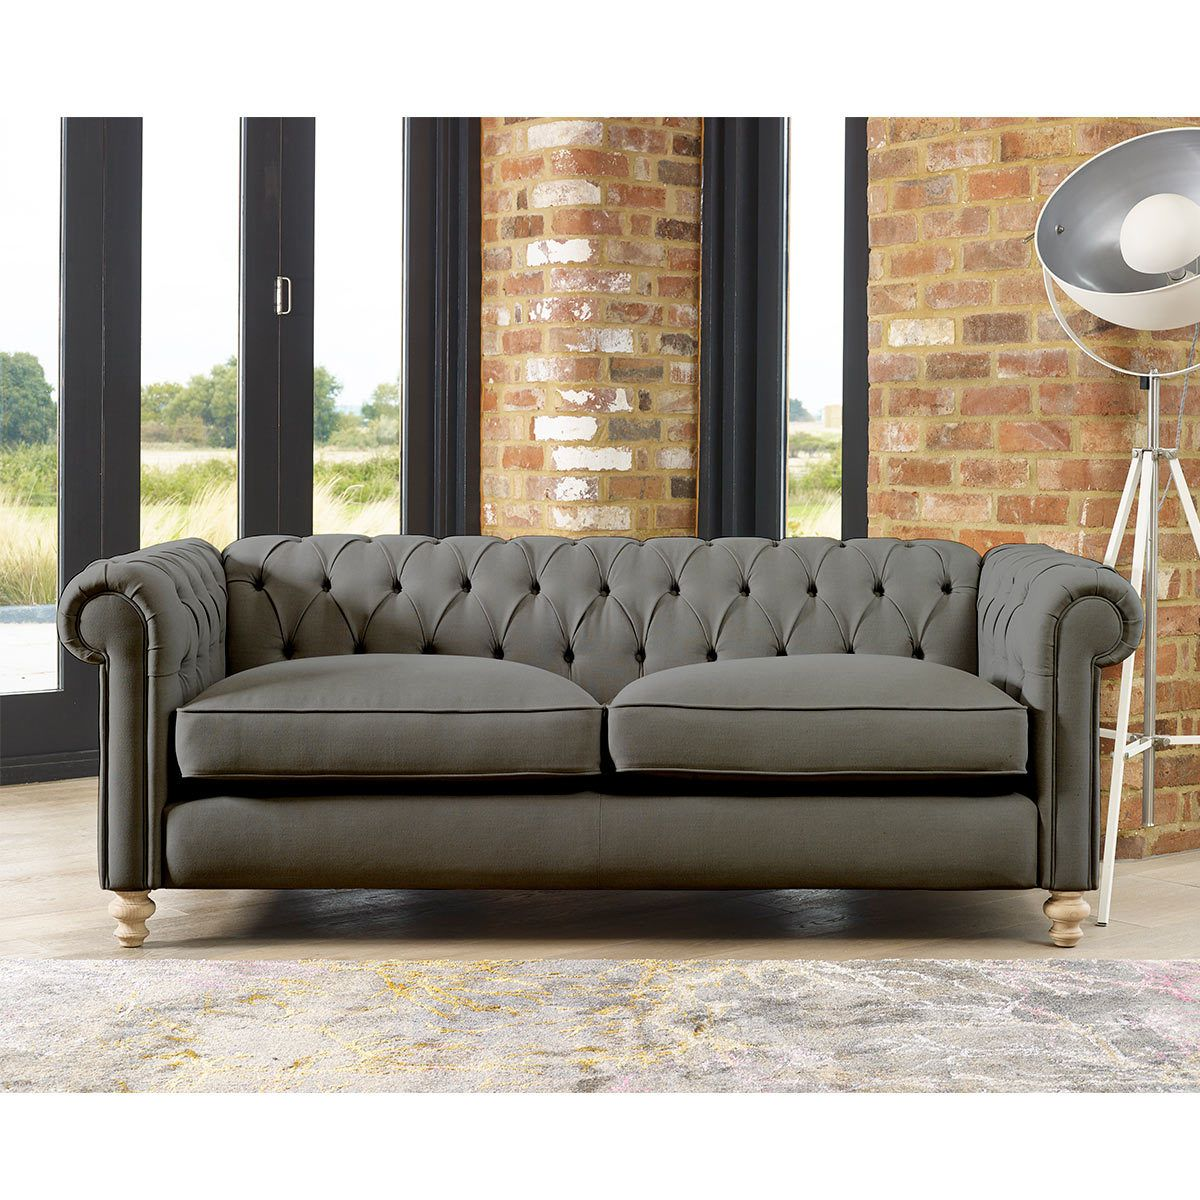 Chesterfield Button Back 4 Seater Fabric Sofa Smoke Costco Uk Sofa Seater Sofa Design